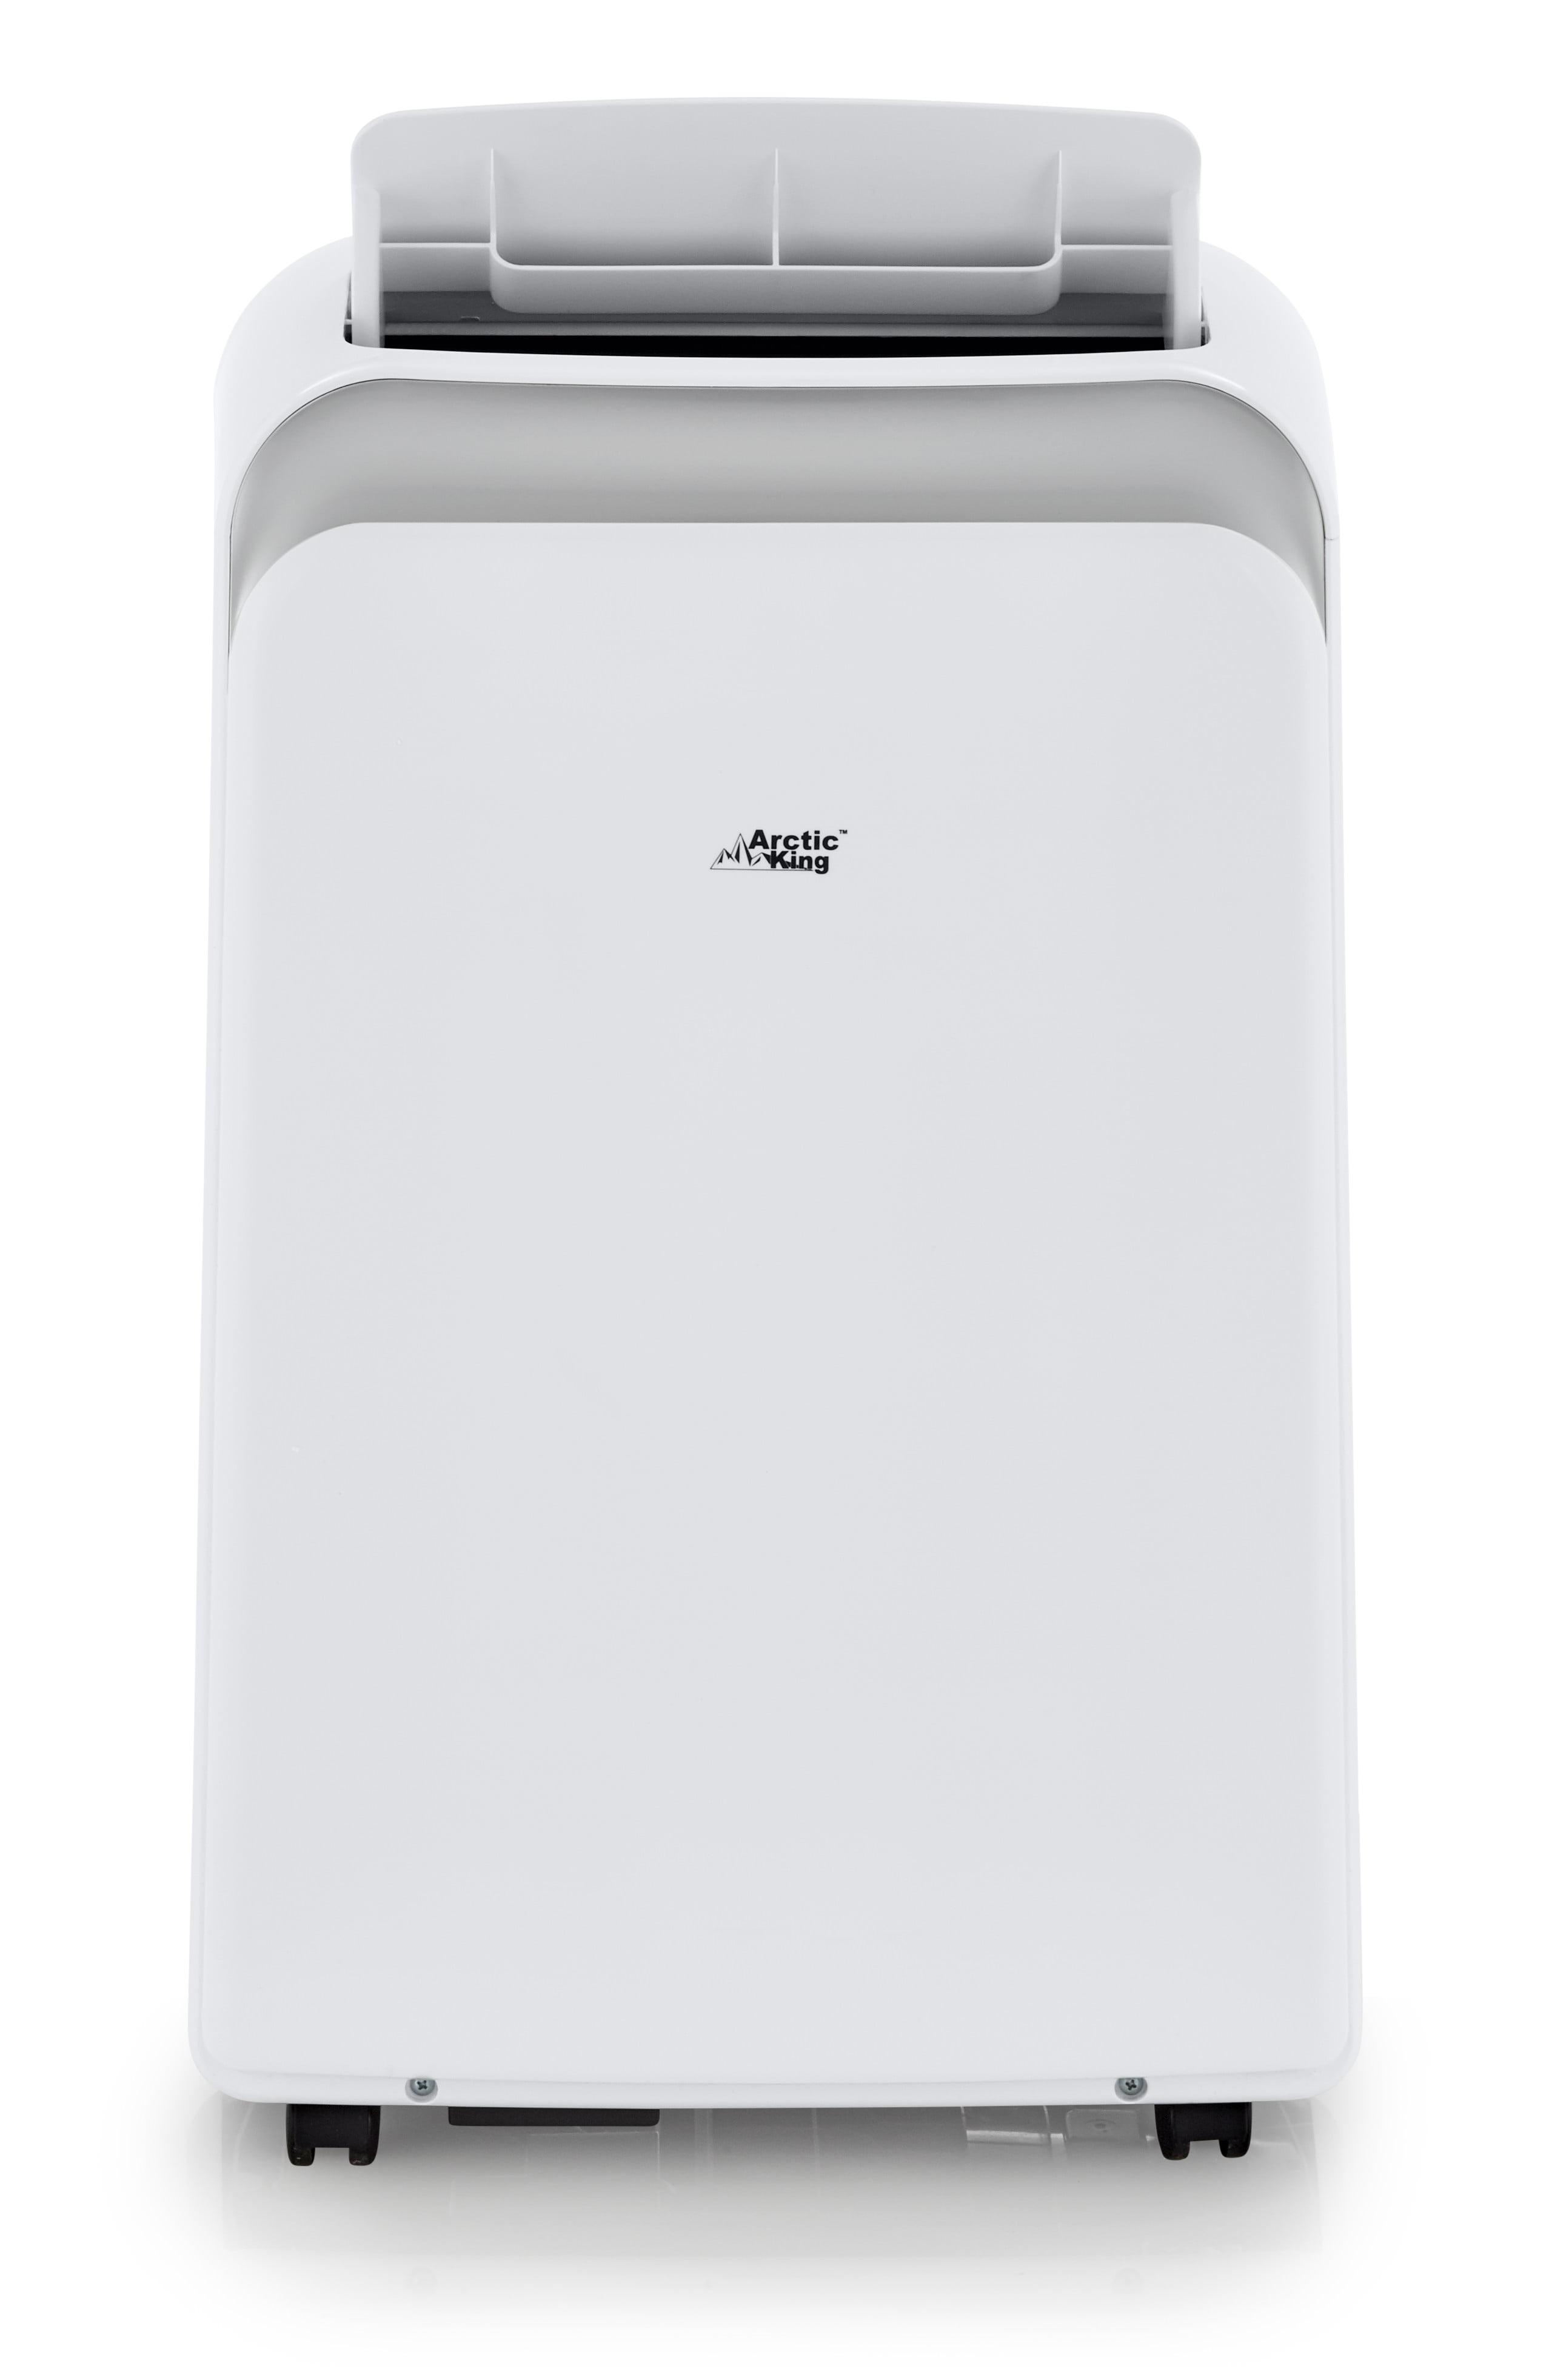 Arctic King 8,000Btu Remote Control Portable Air Conditioner, White